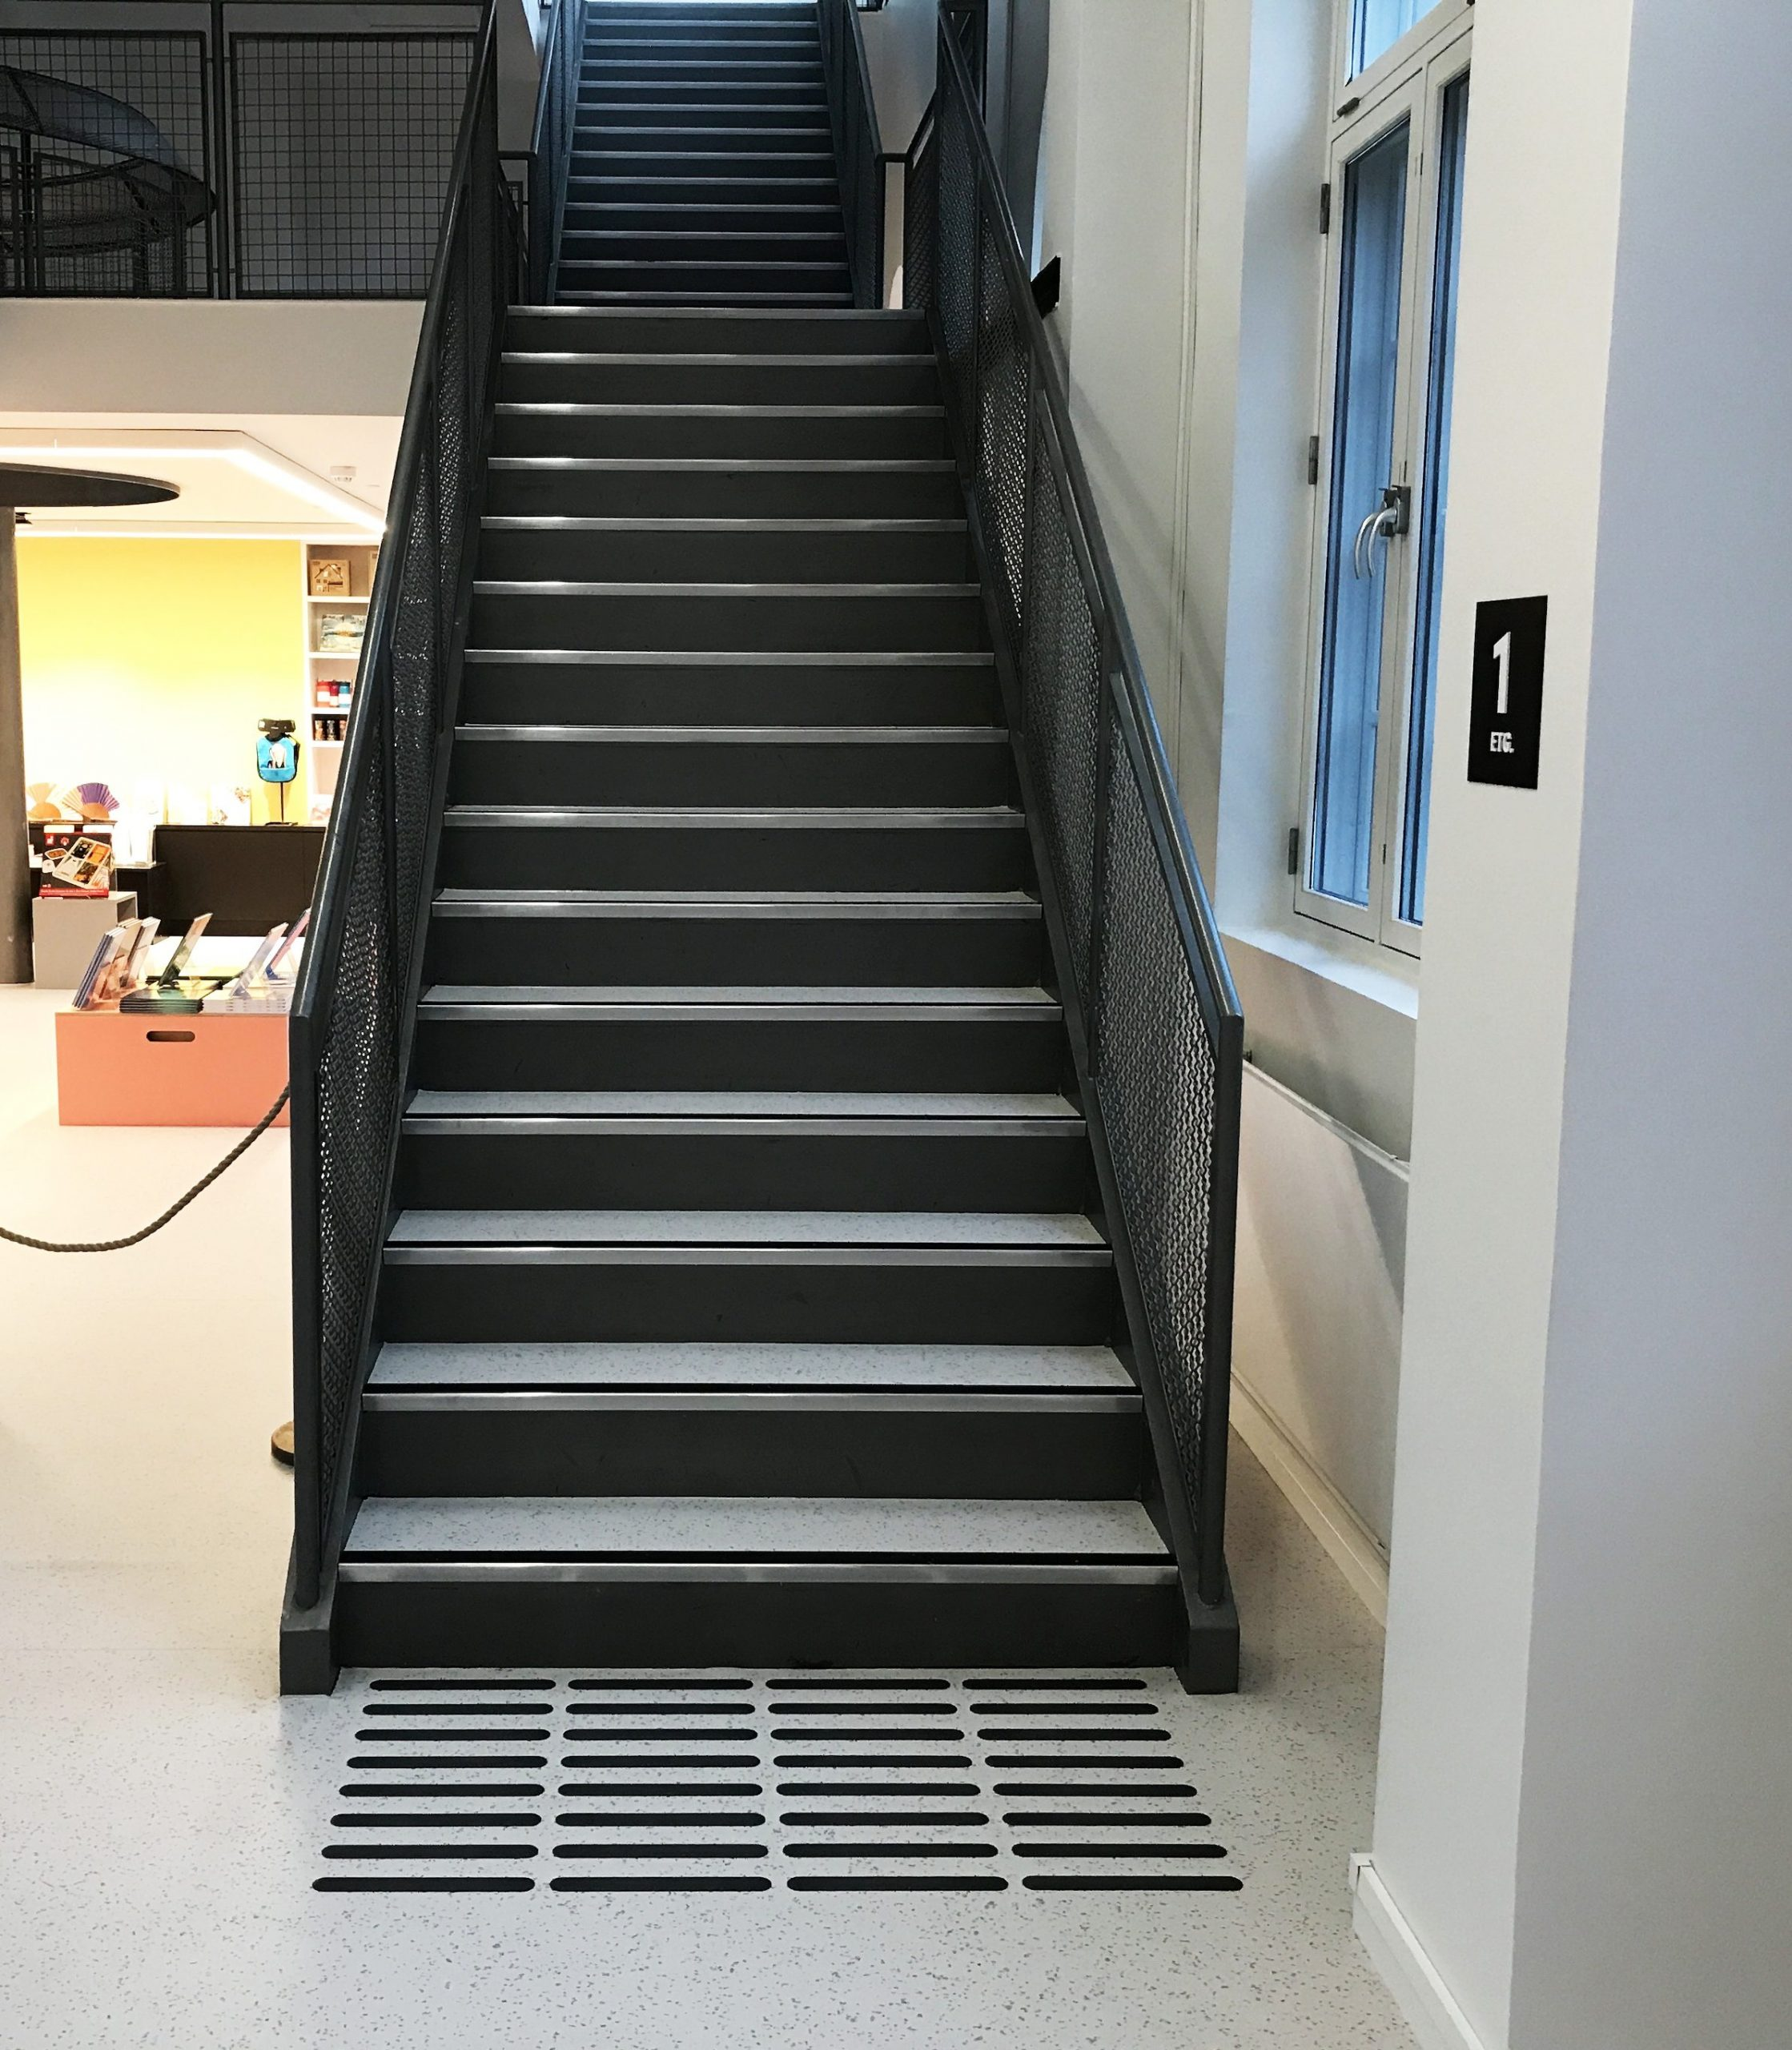 Oppmerksomhetsfelt på bunnen av trapp